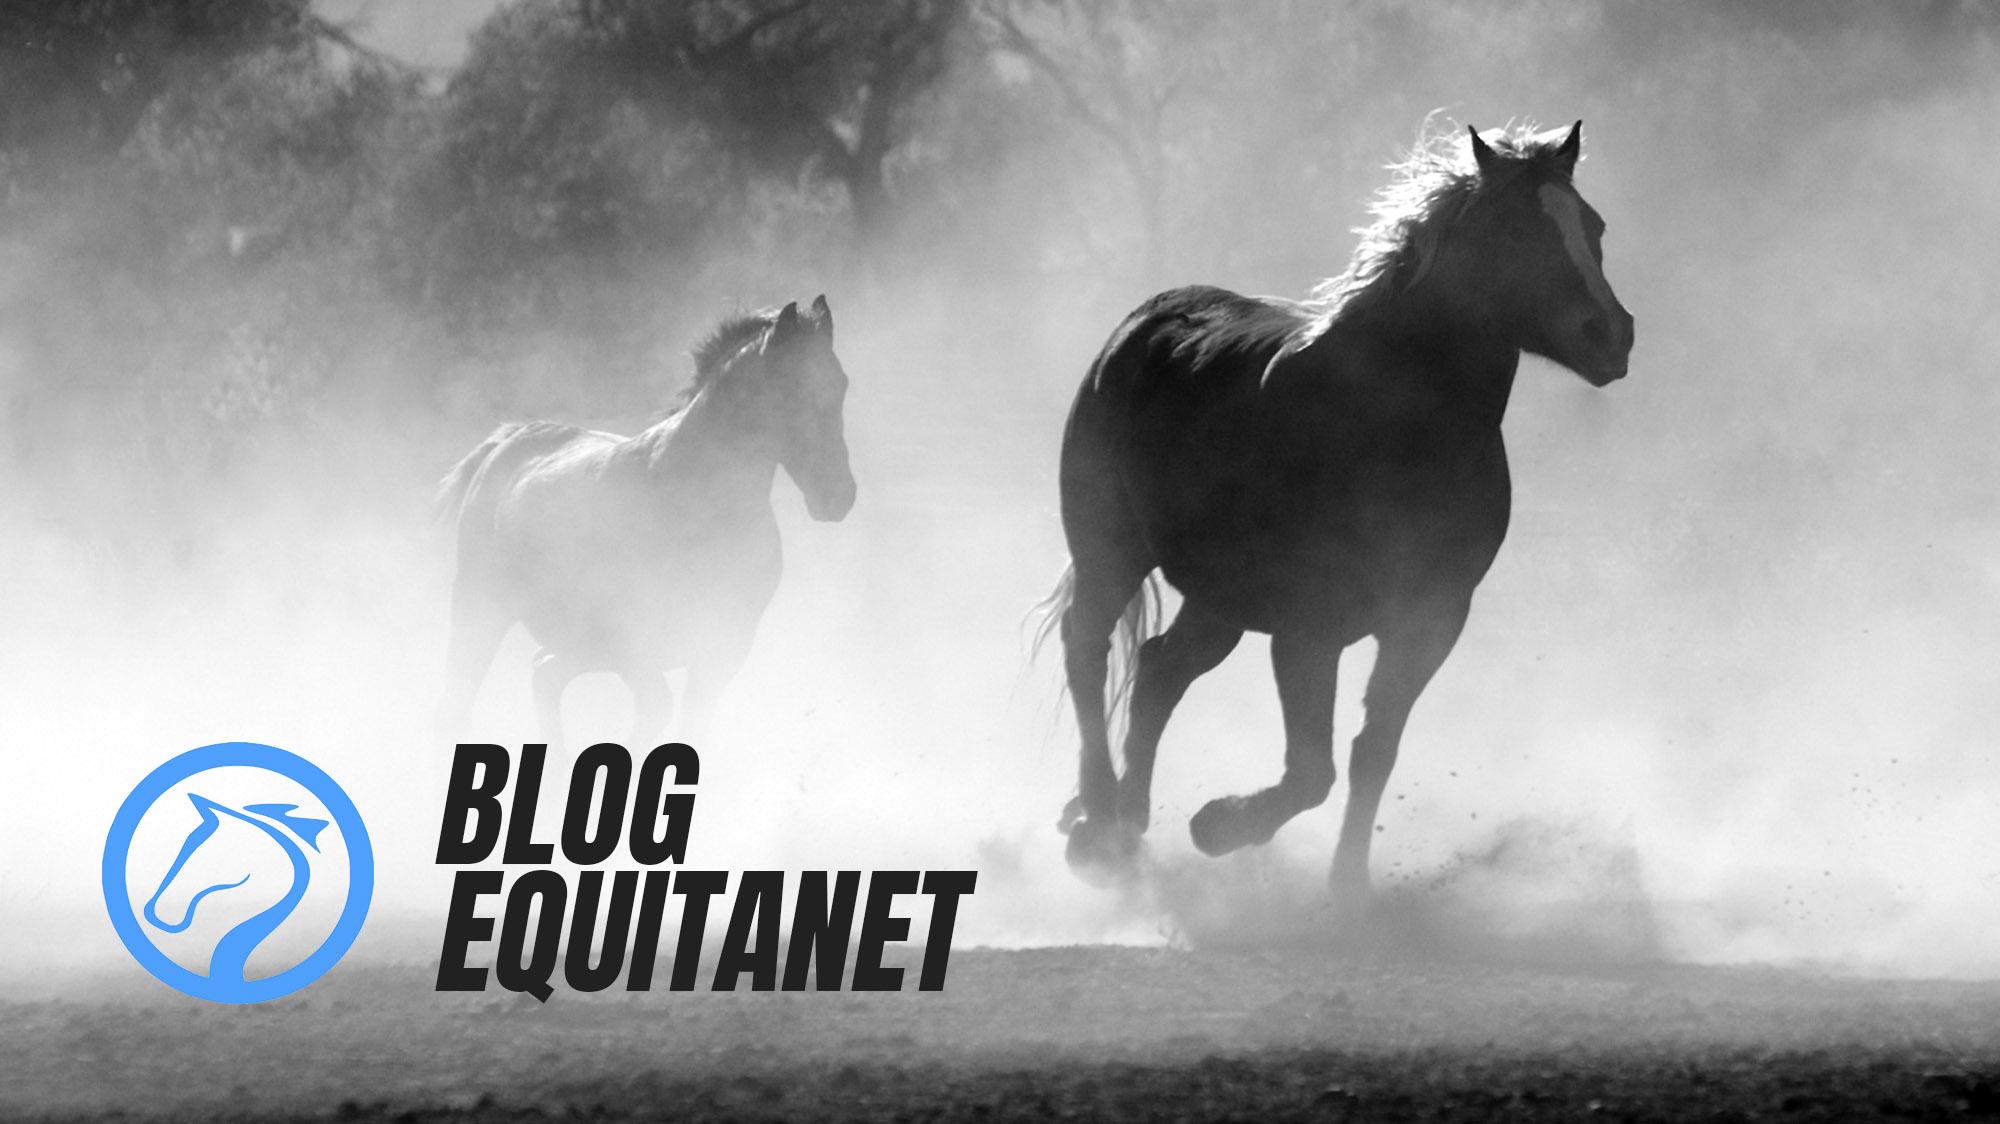 Blog Equitanet